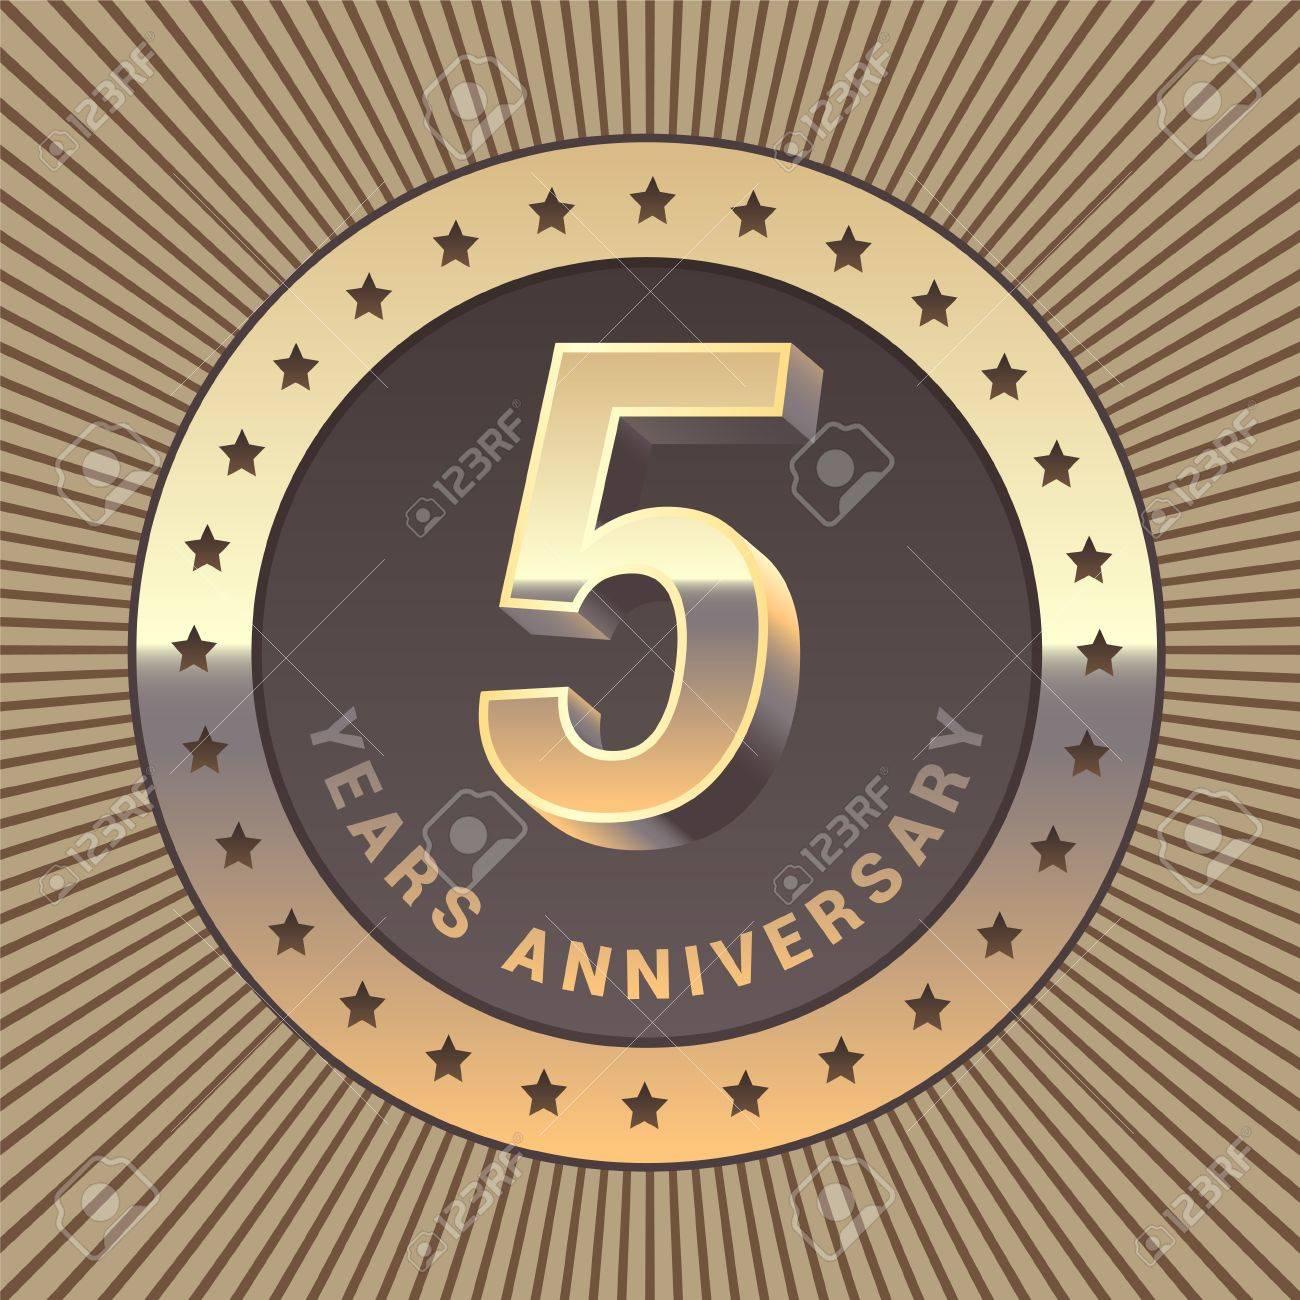 5 years anniversary vector icon logo graphic design element 5 years anniversary vector icon logo graphic design element or emblem as a golden biocorpaavc Choice Image